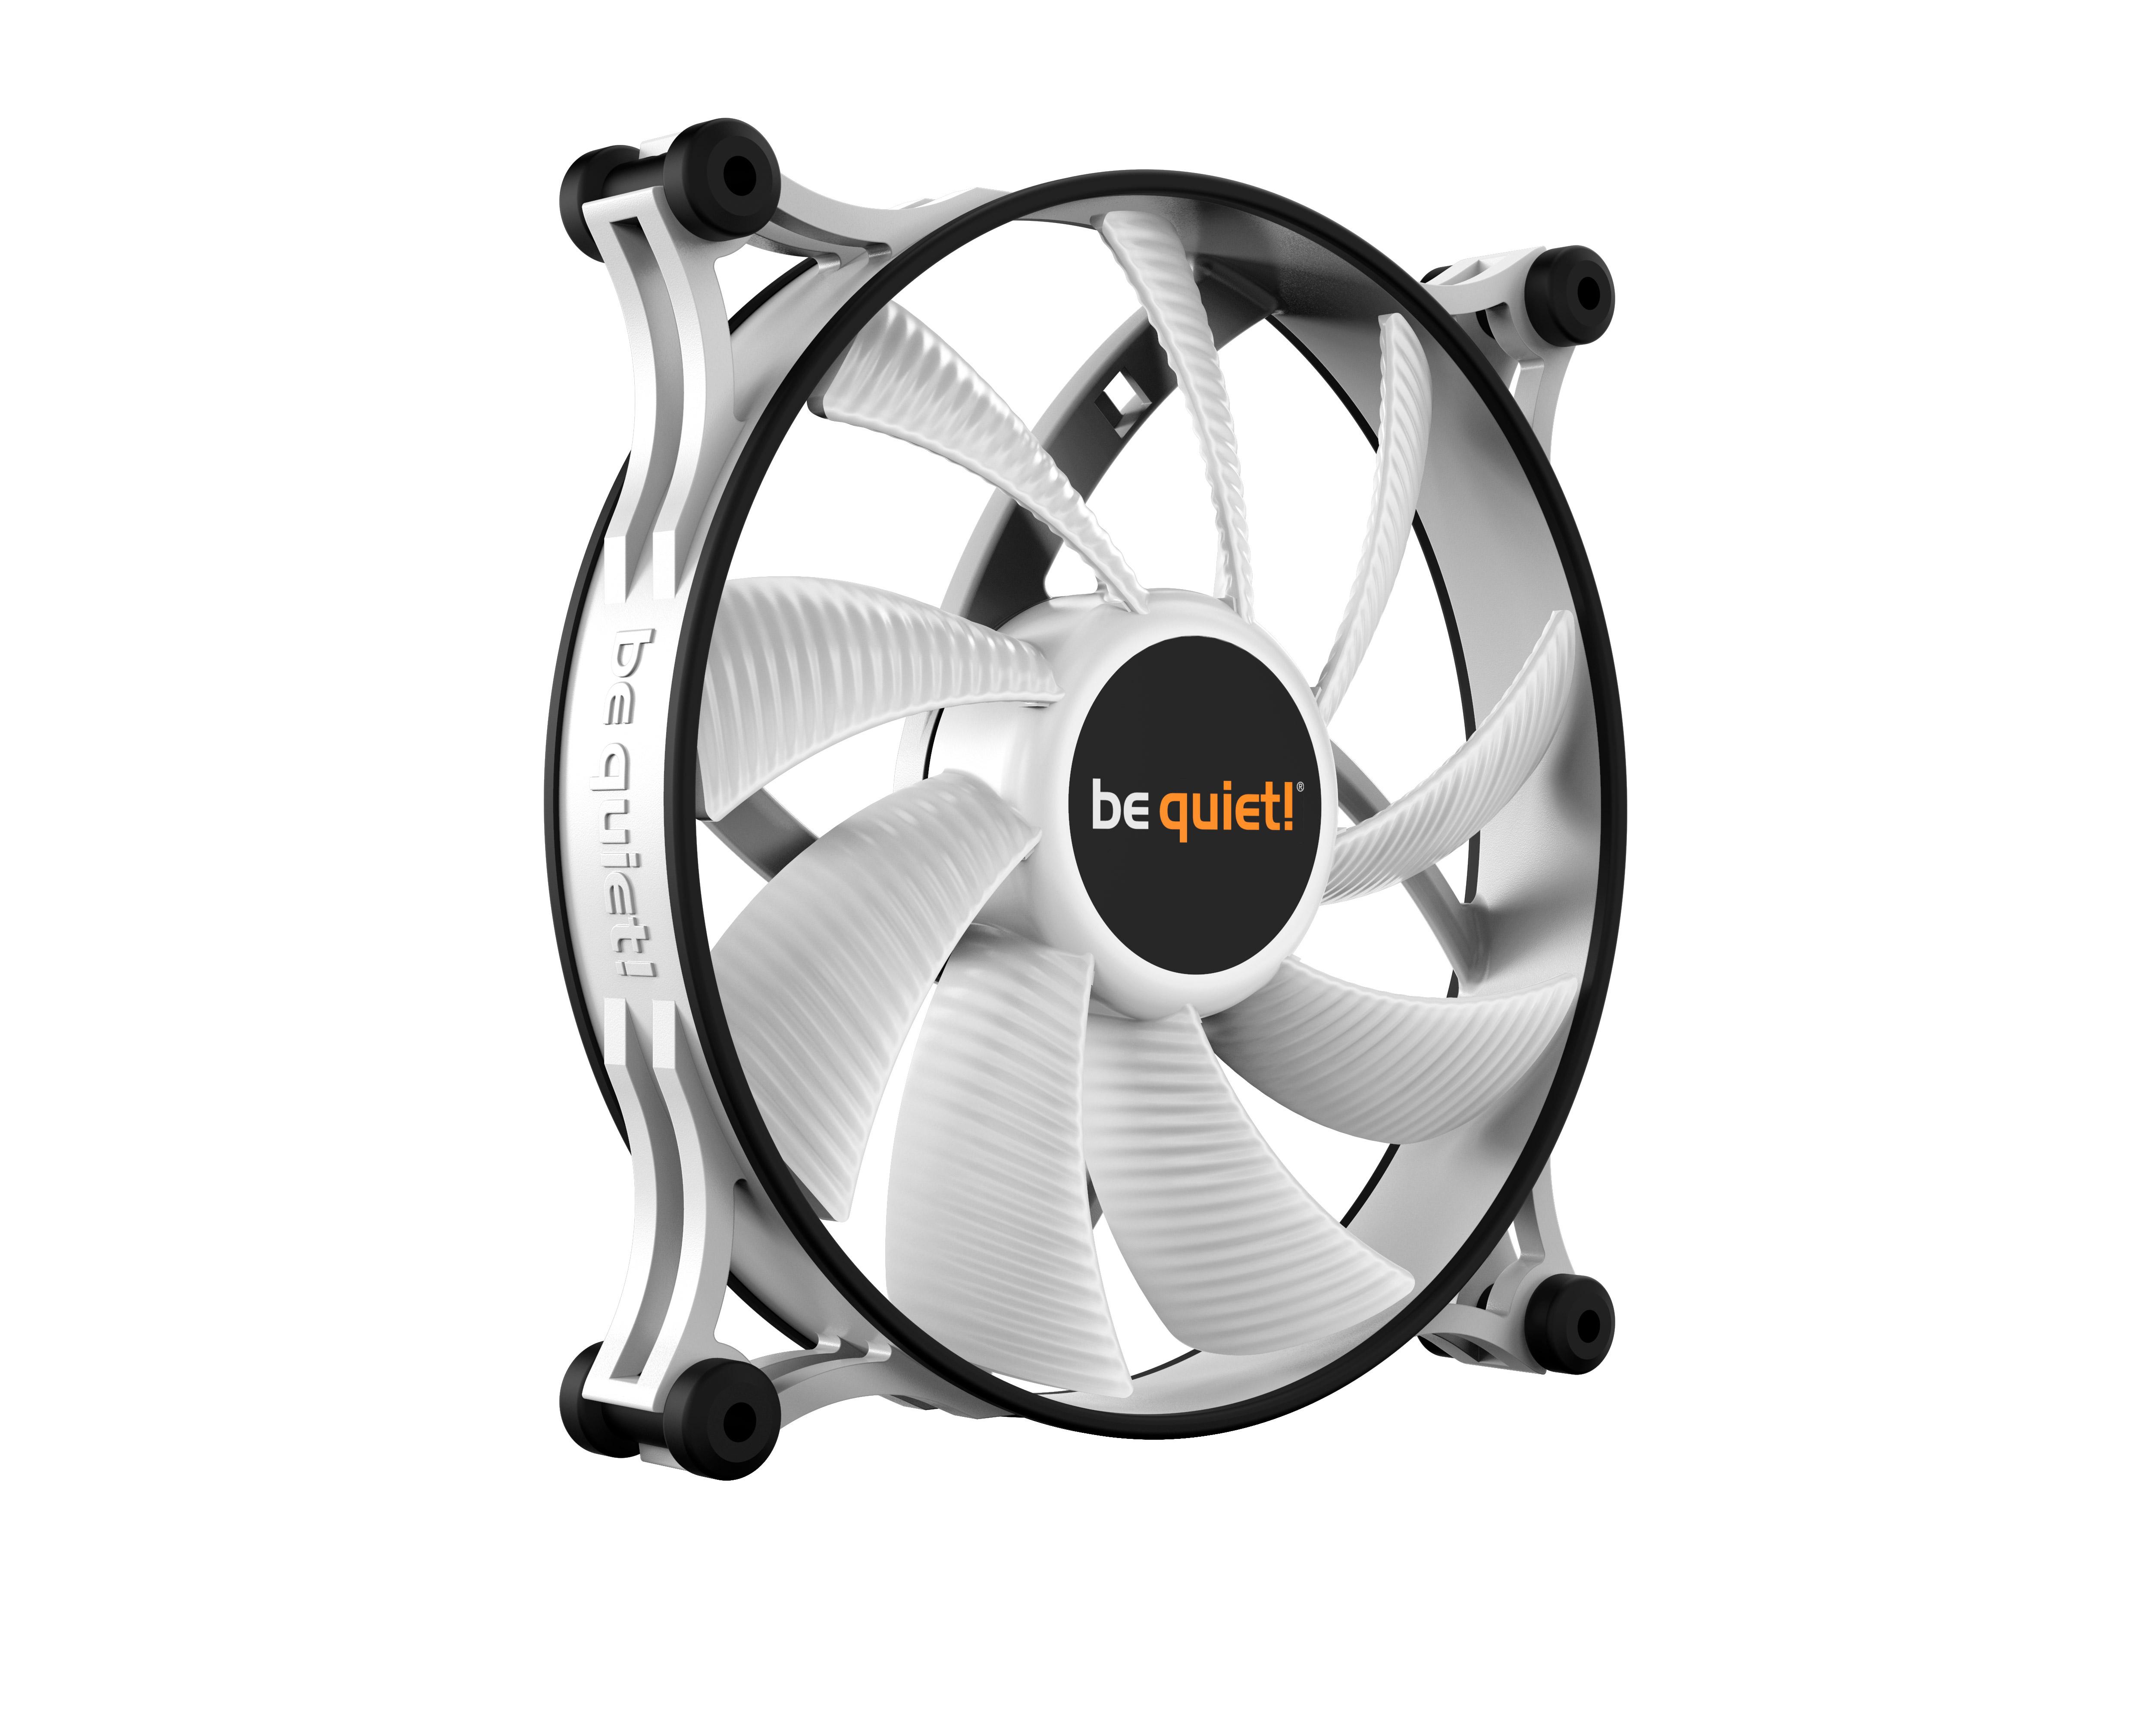 Be Quiet! BL090 - Computergehäuse - Ventilator - 14 cm - 900 RPM - 14,7 dB - 49,8 cfm